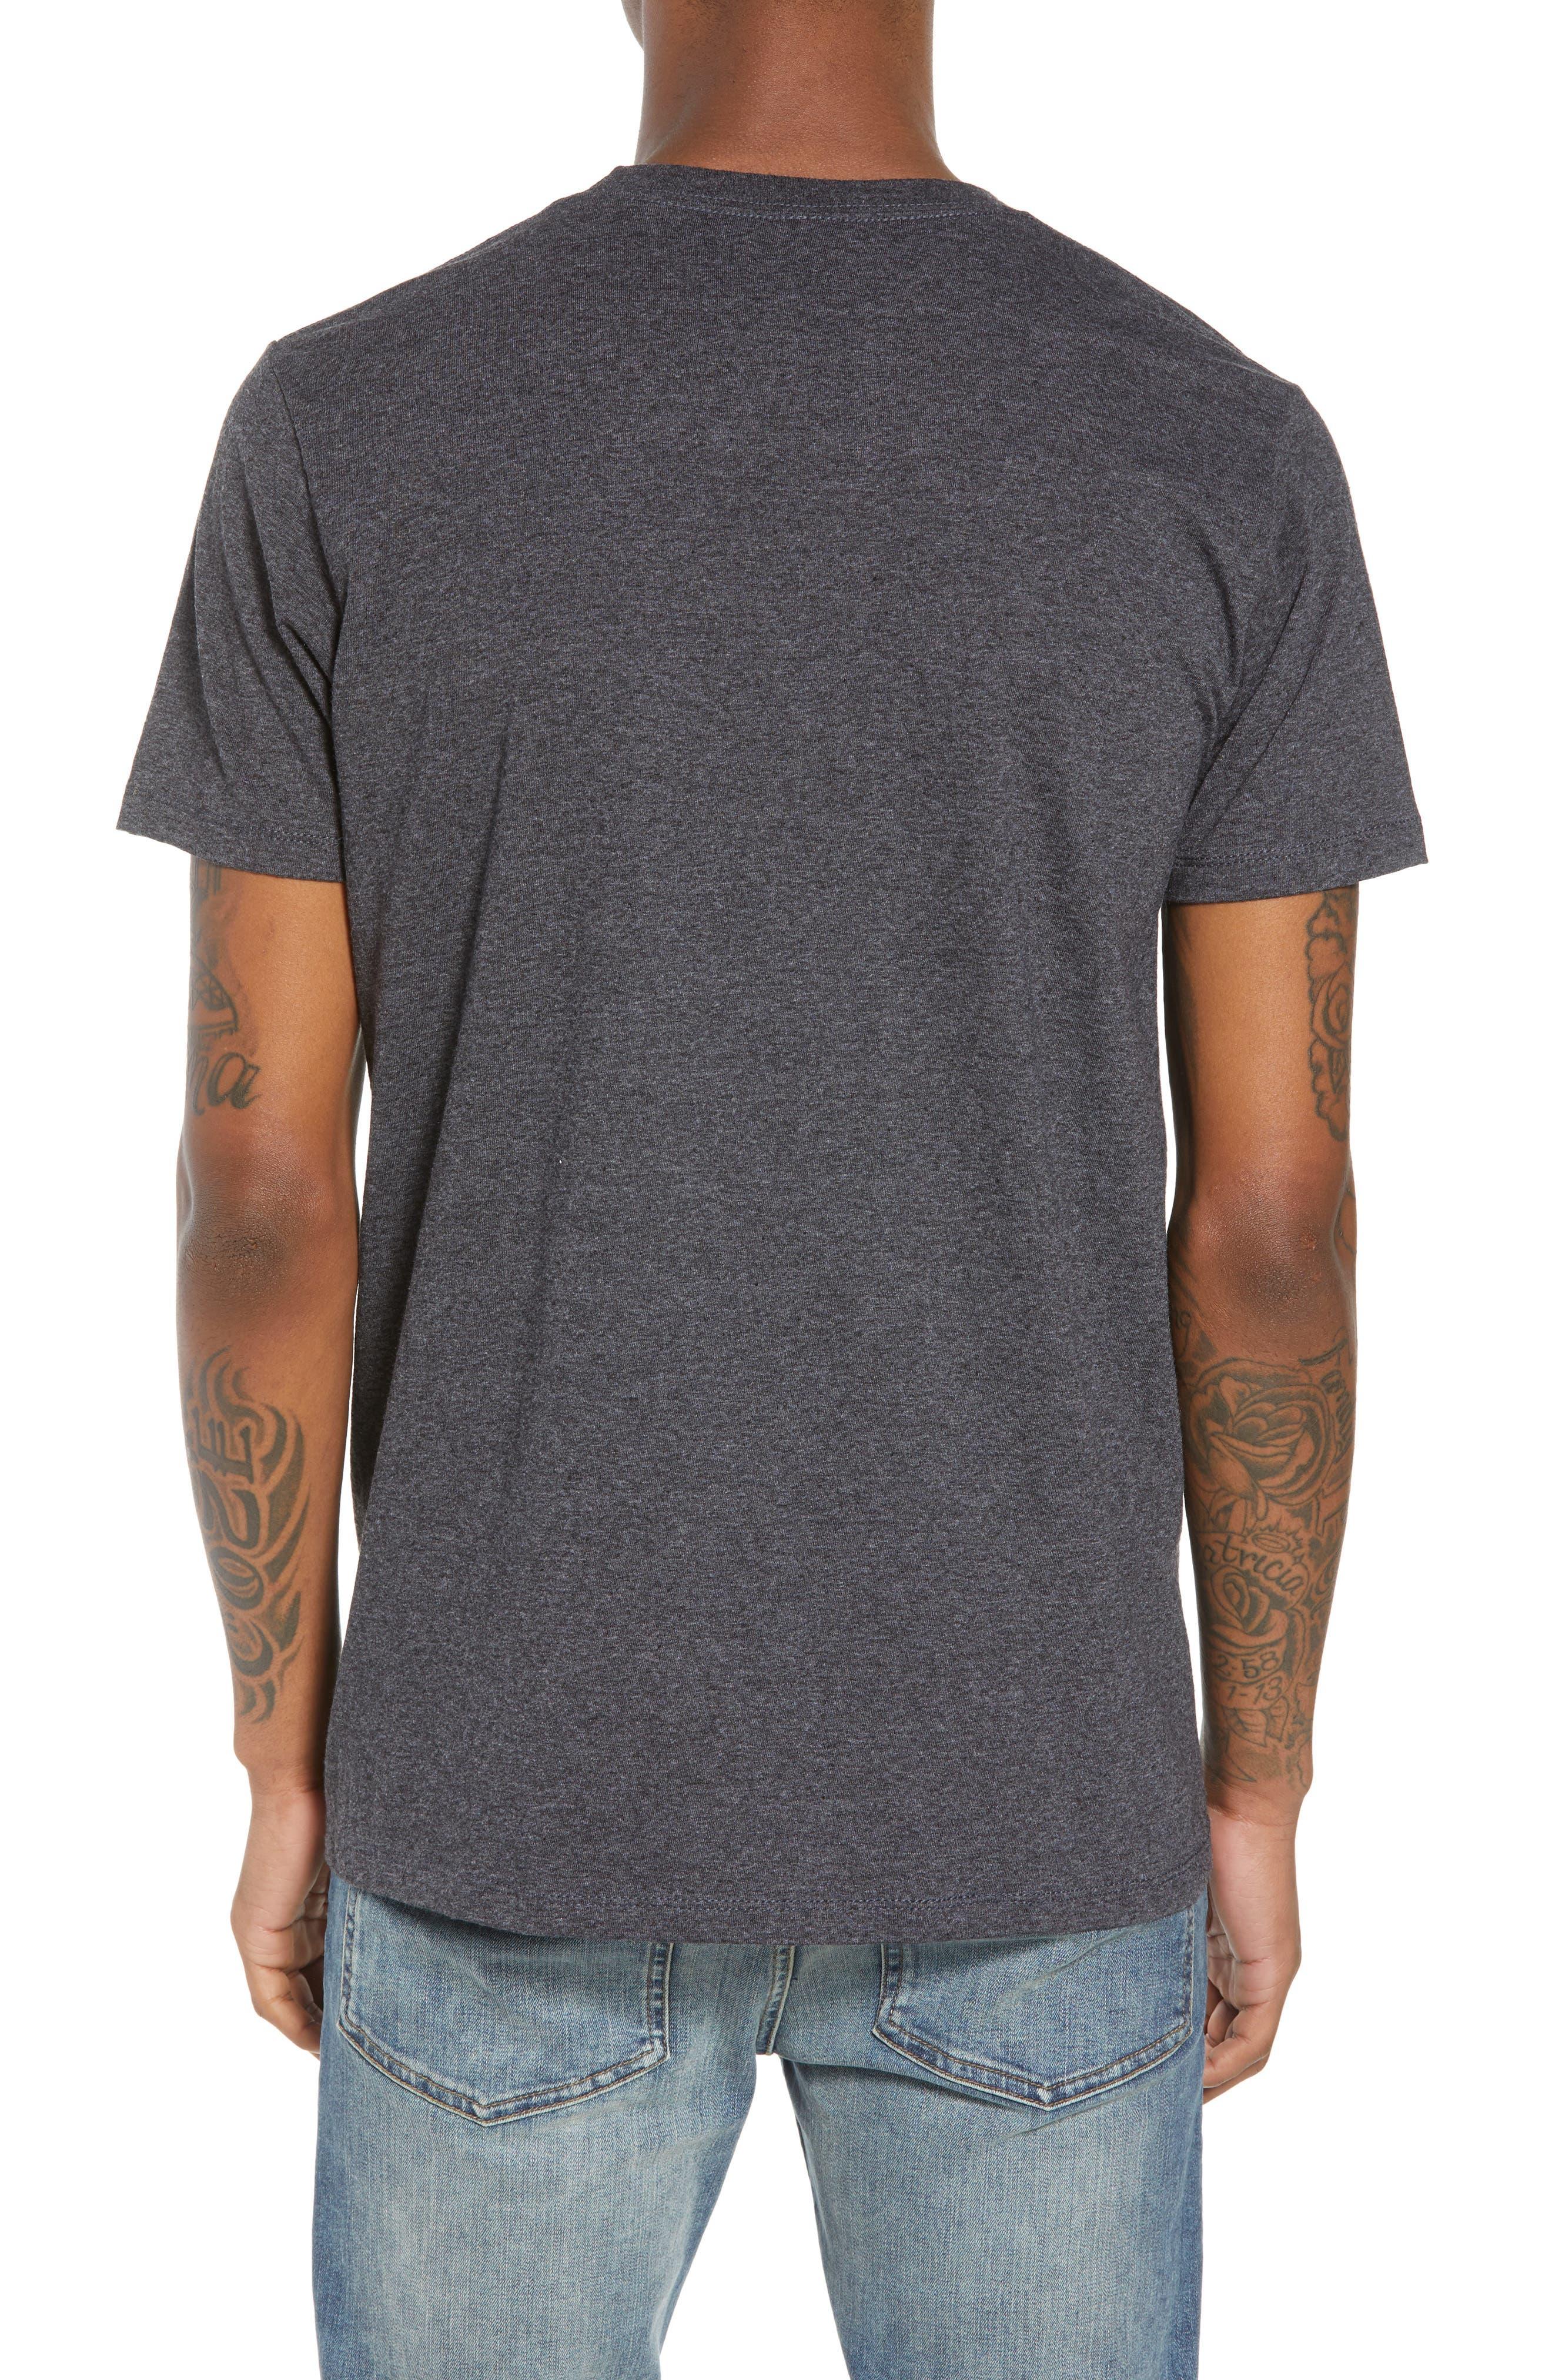 Adultish T-Shirt,                             Alternate thumbnail 2, color,                             001